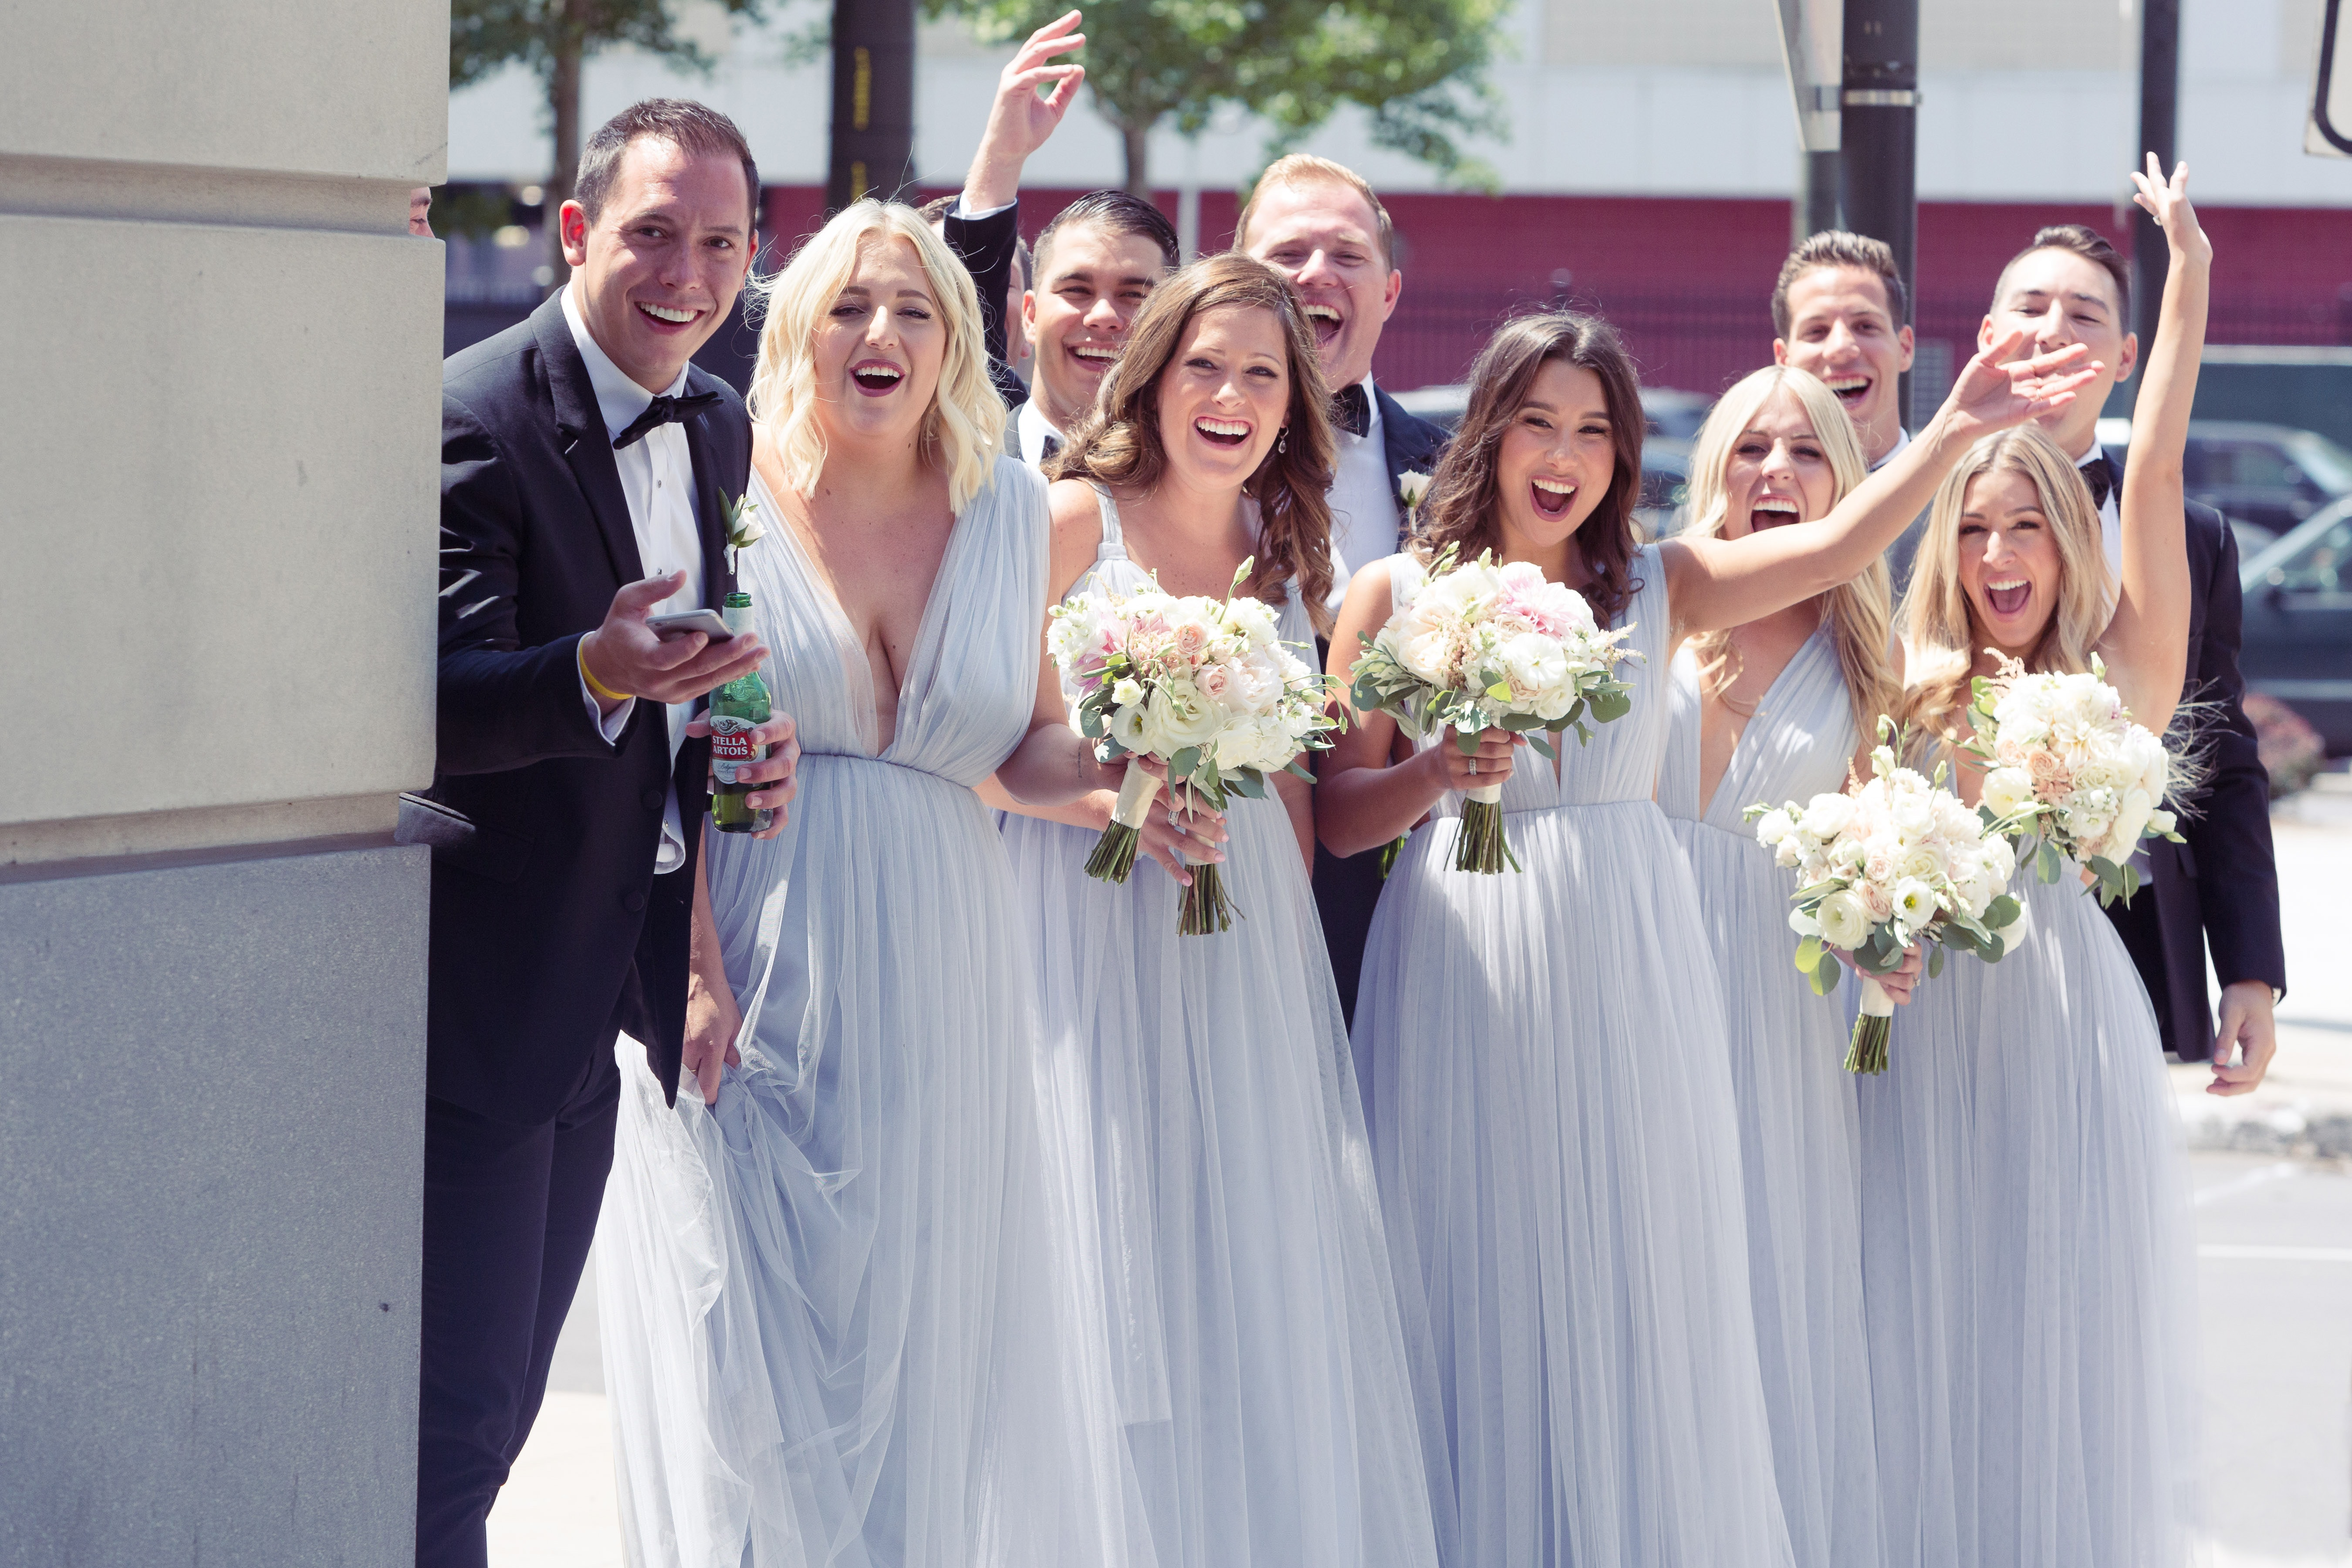 wedding party, congrats, colony club, simply brilliant events